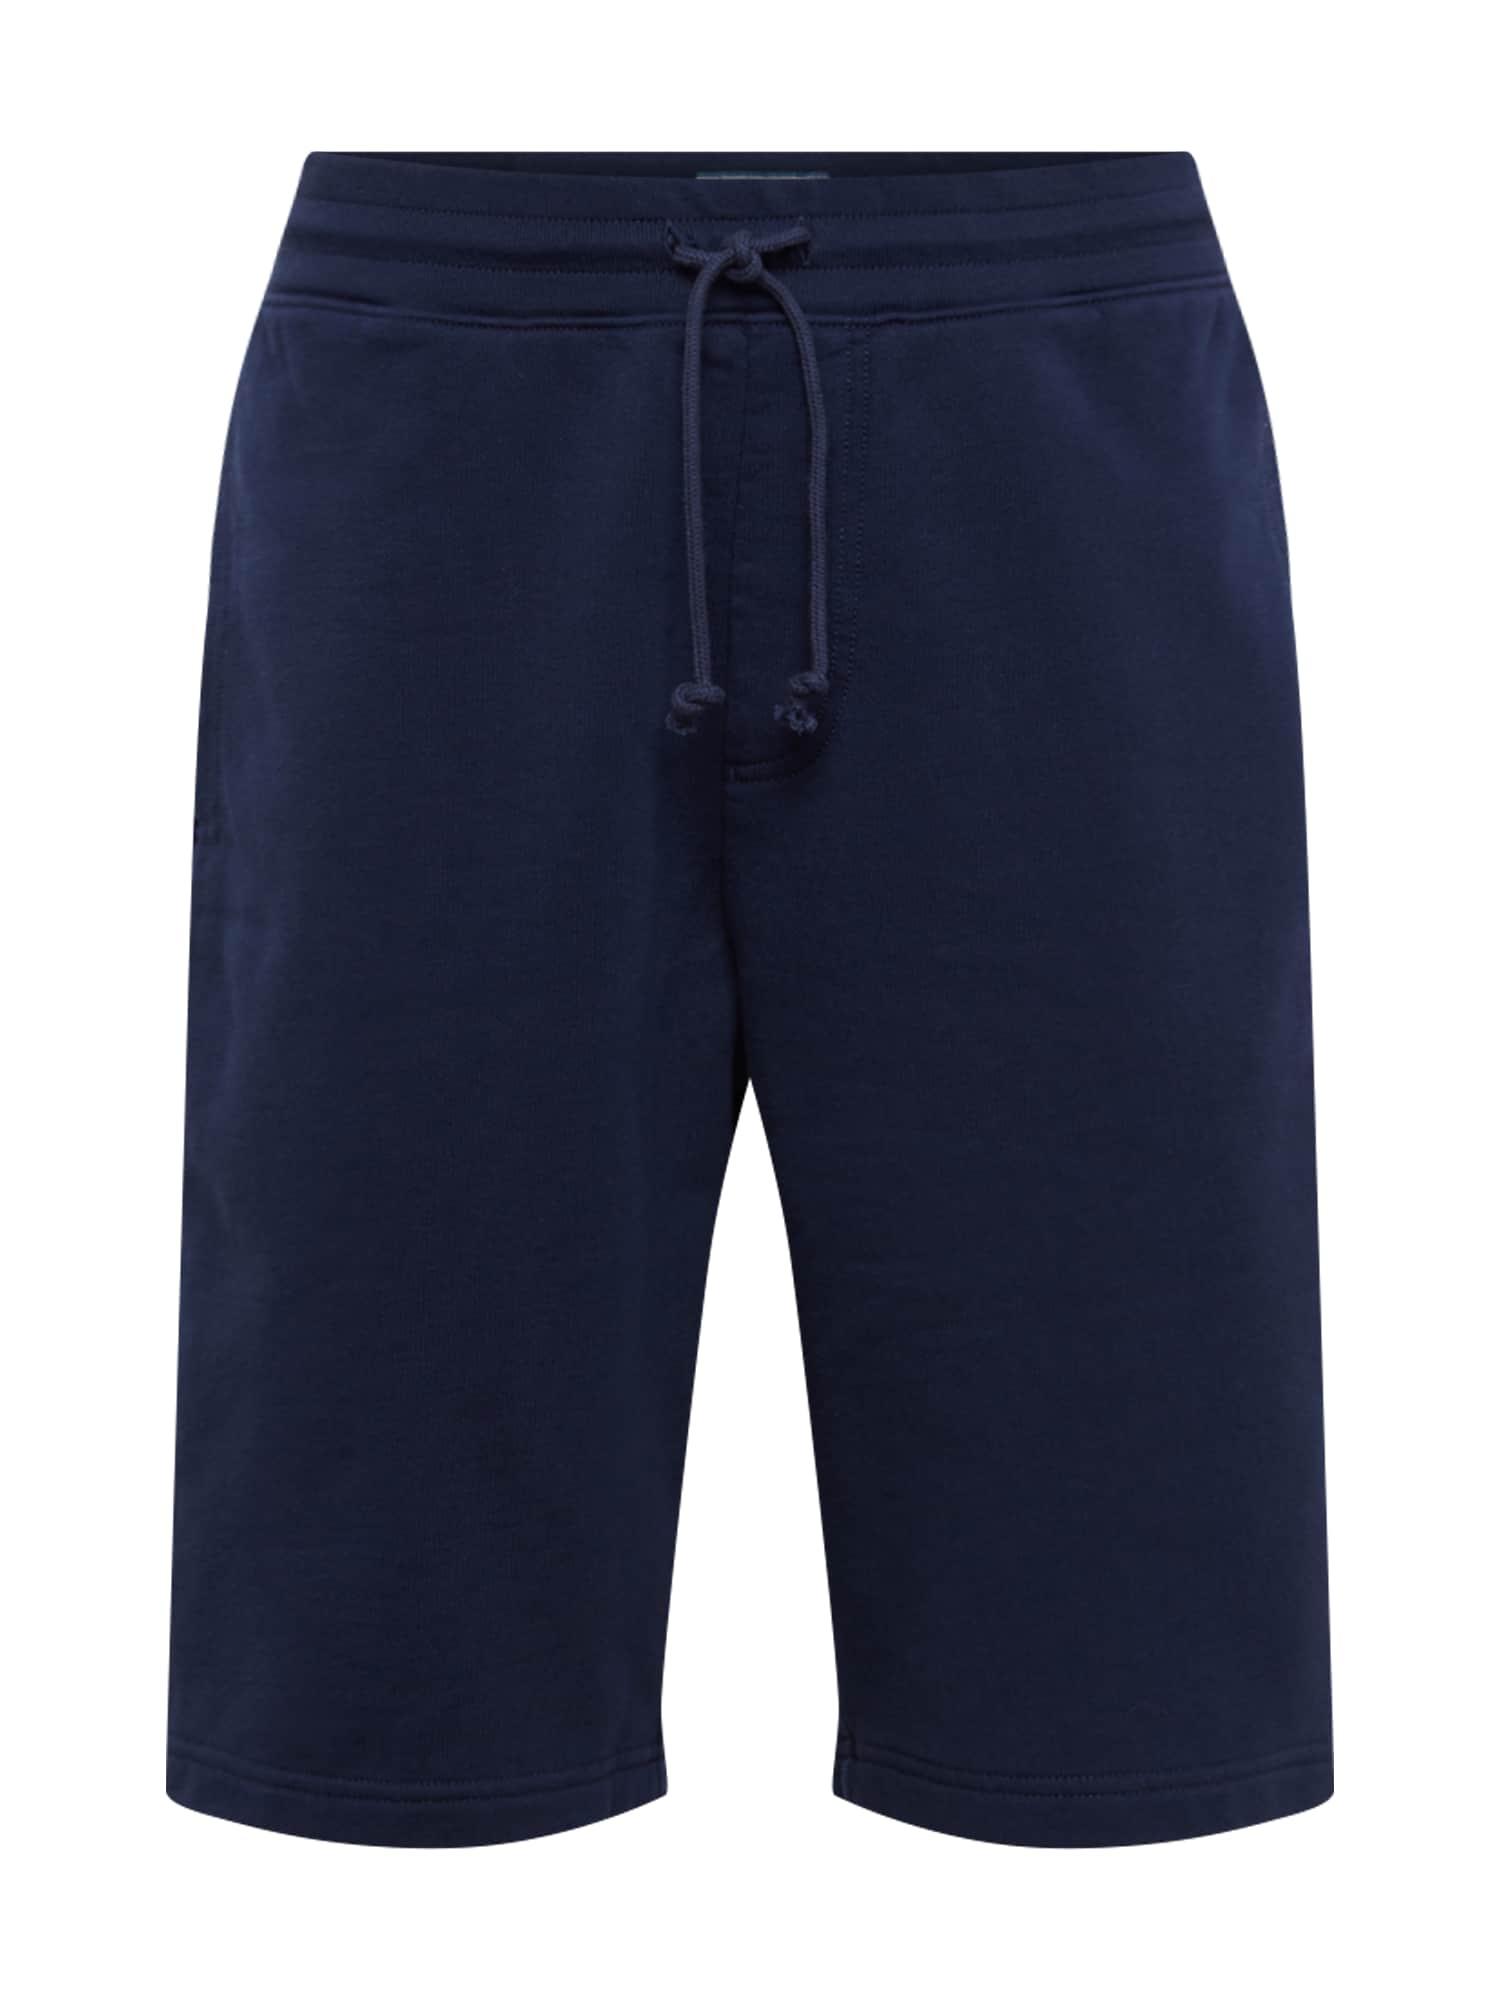 Kalhoty TJM TOMMY CLASSICS SWEATSHORT tmavě modrá Tommy Jeans